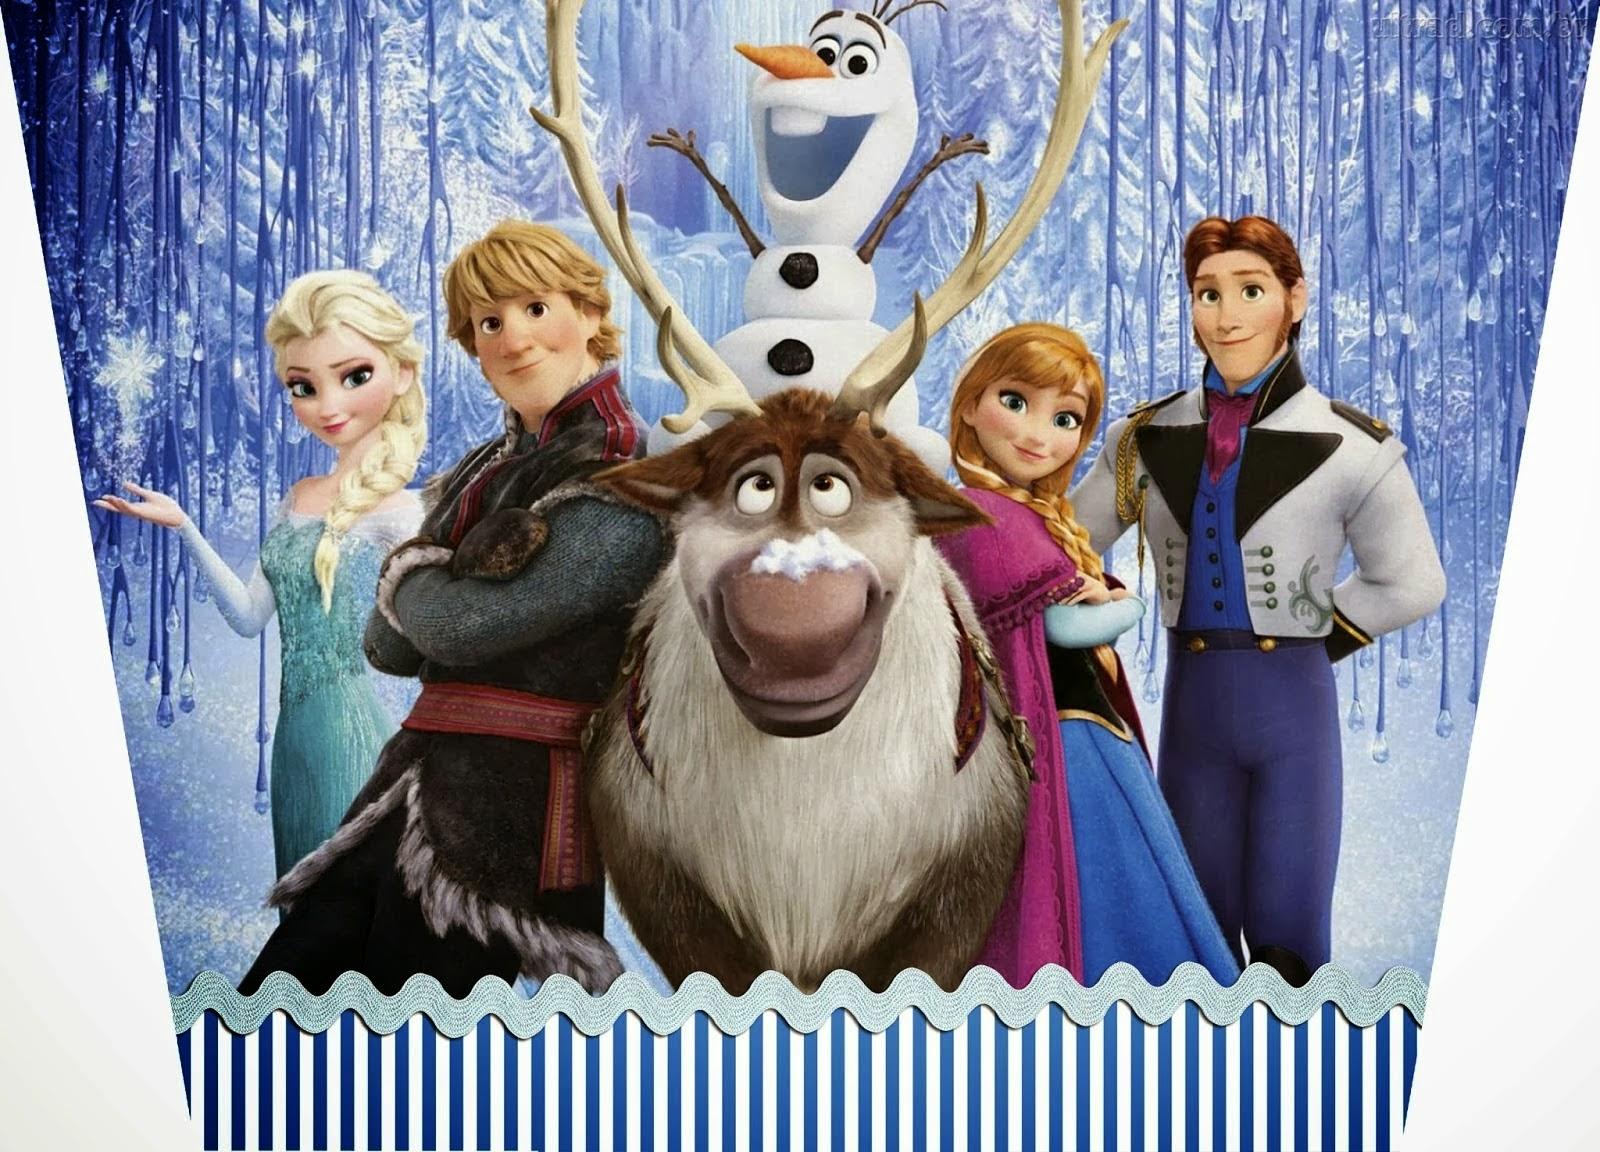 Imprimible gratis de Frozen - Fiesta de princesas